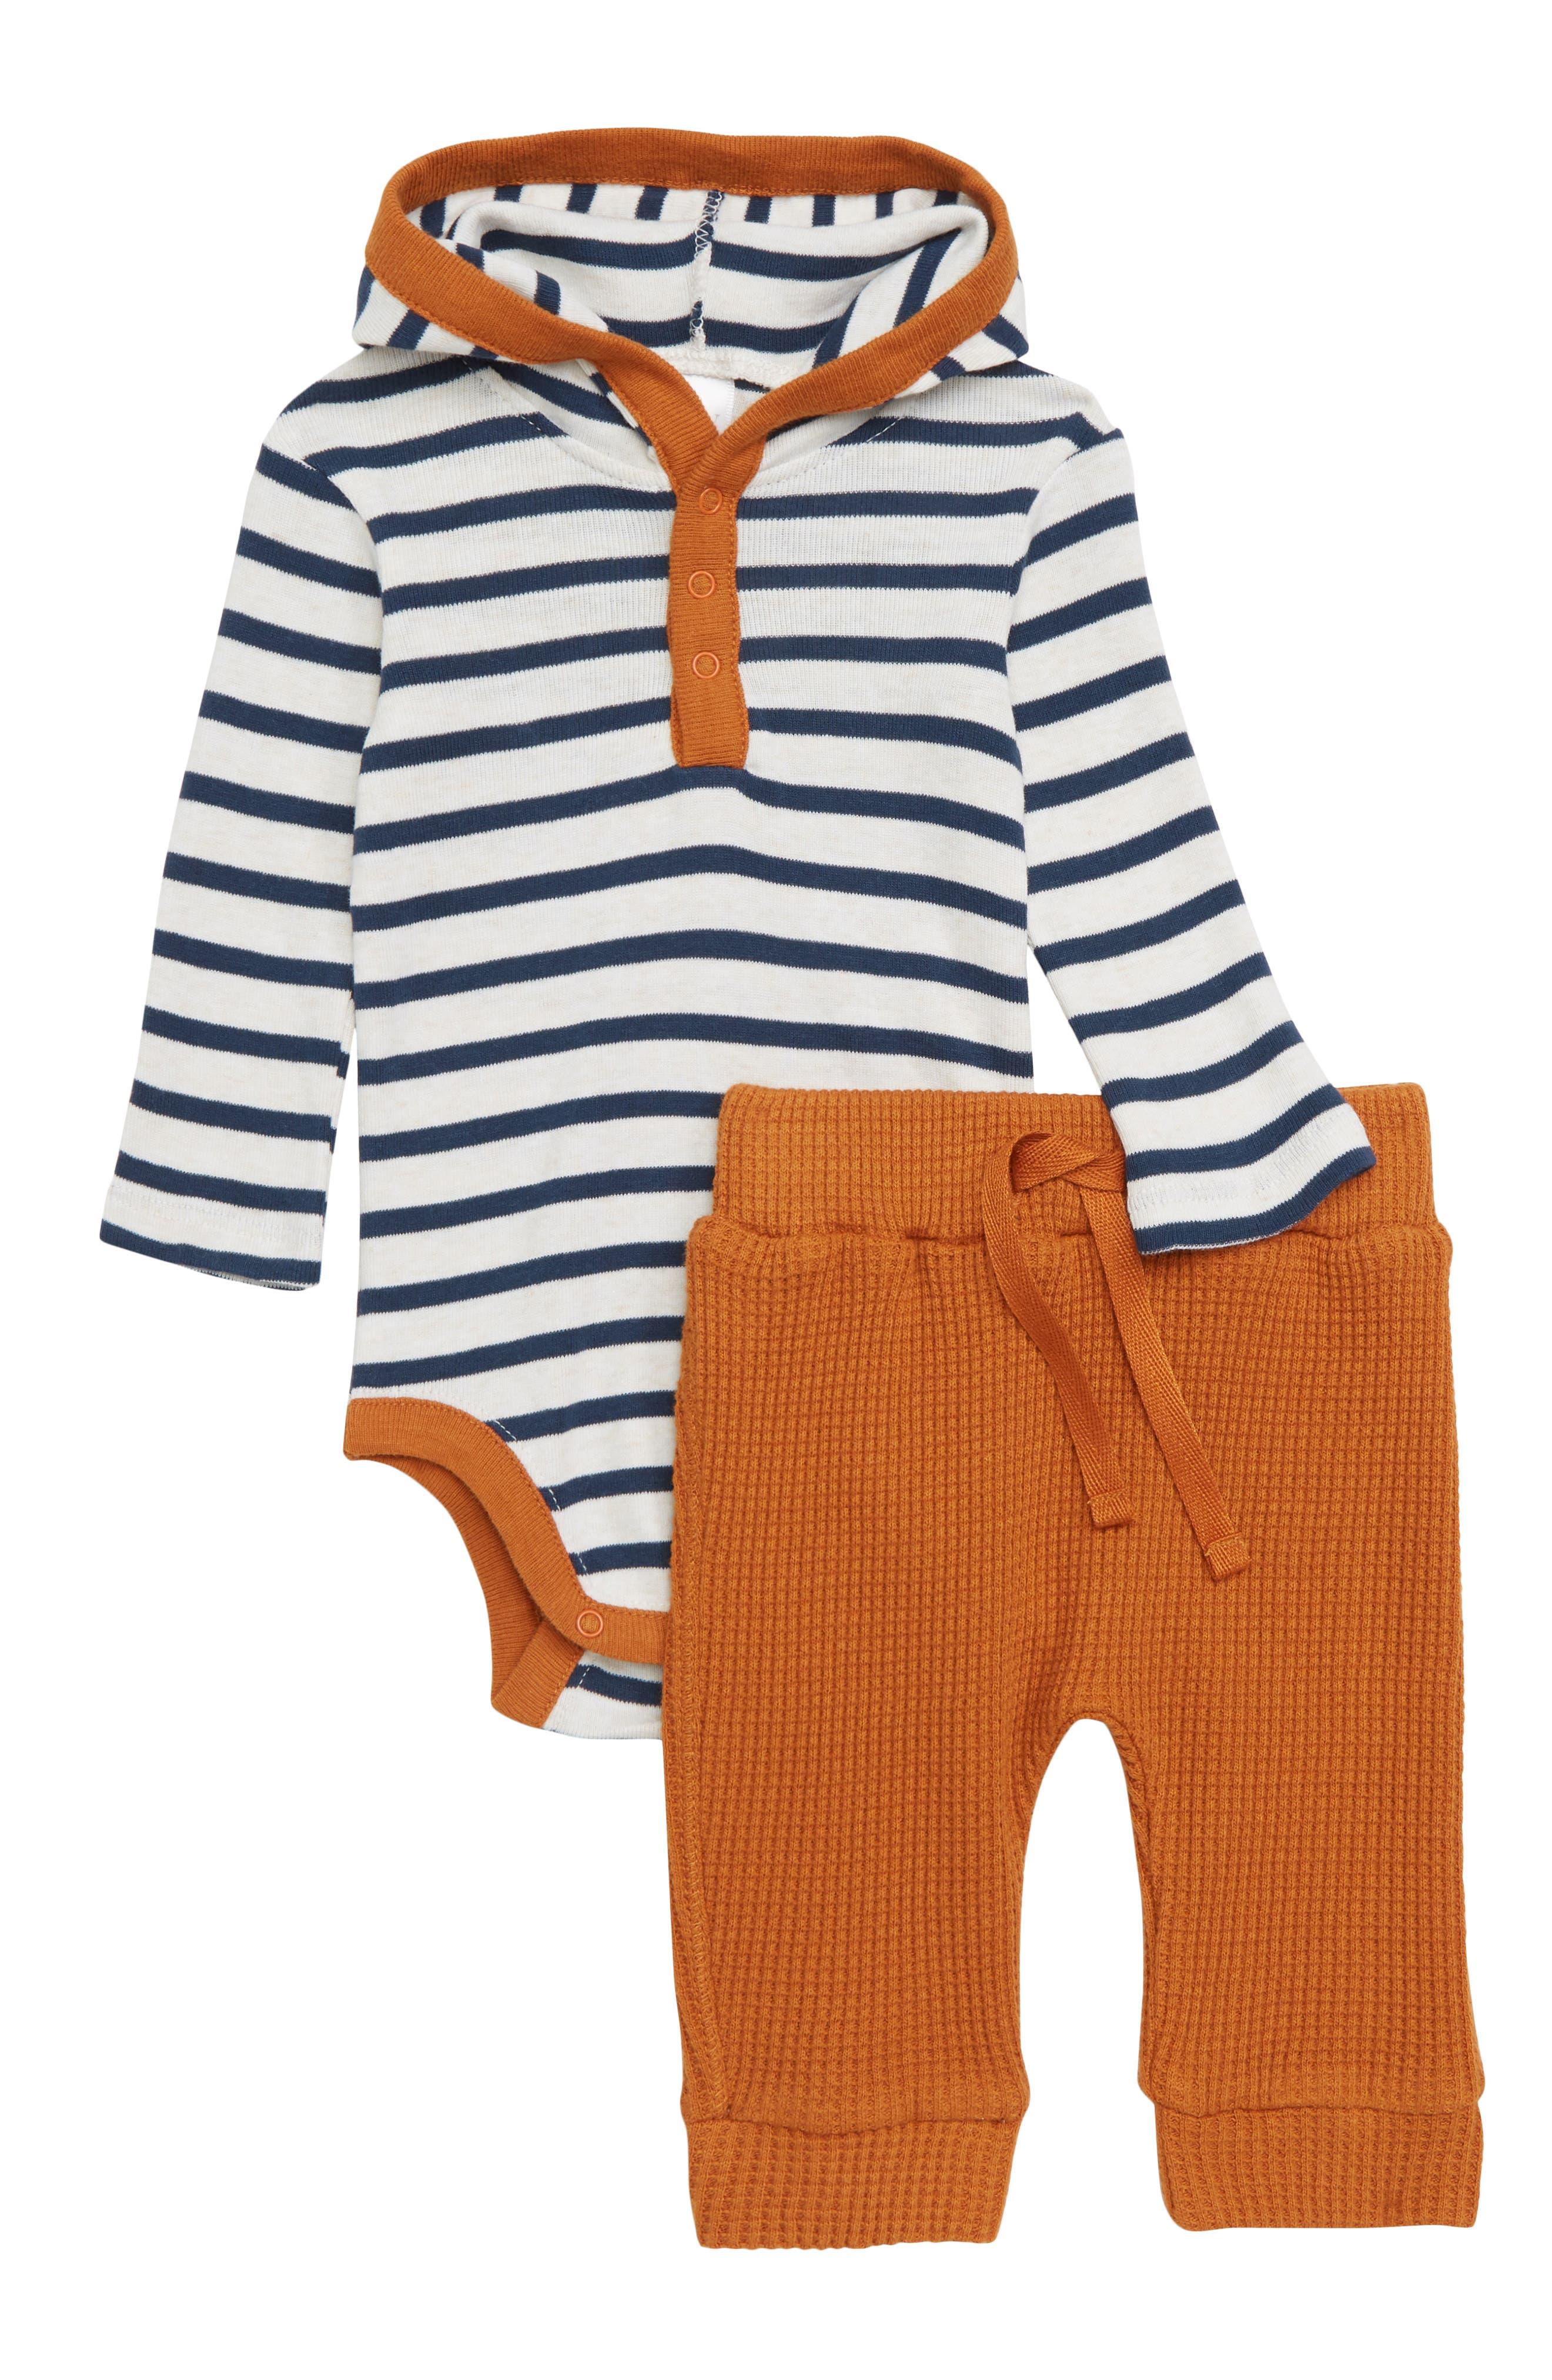 Stripe Hooded Bodysuit & Thermal Pants Set,                             Main thumbnail 1, color,                             900